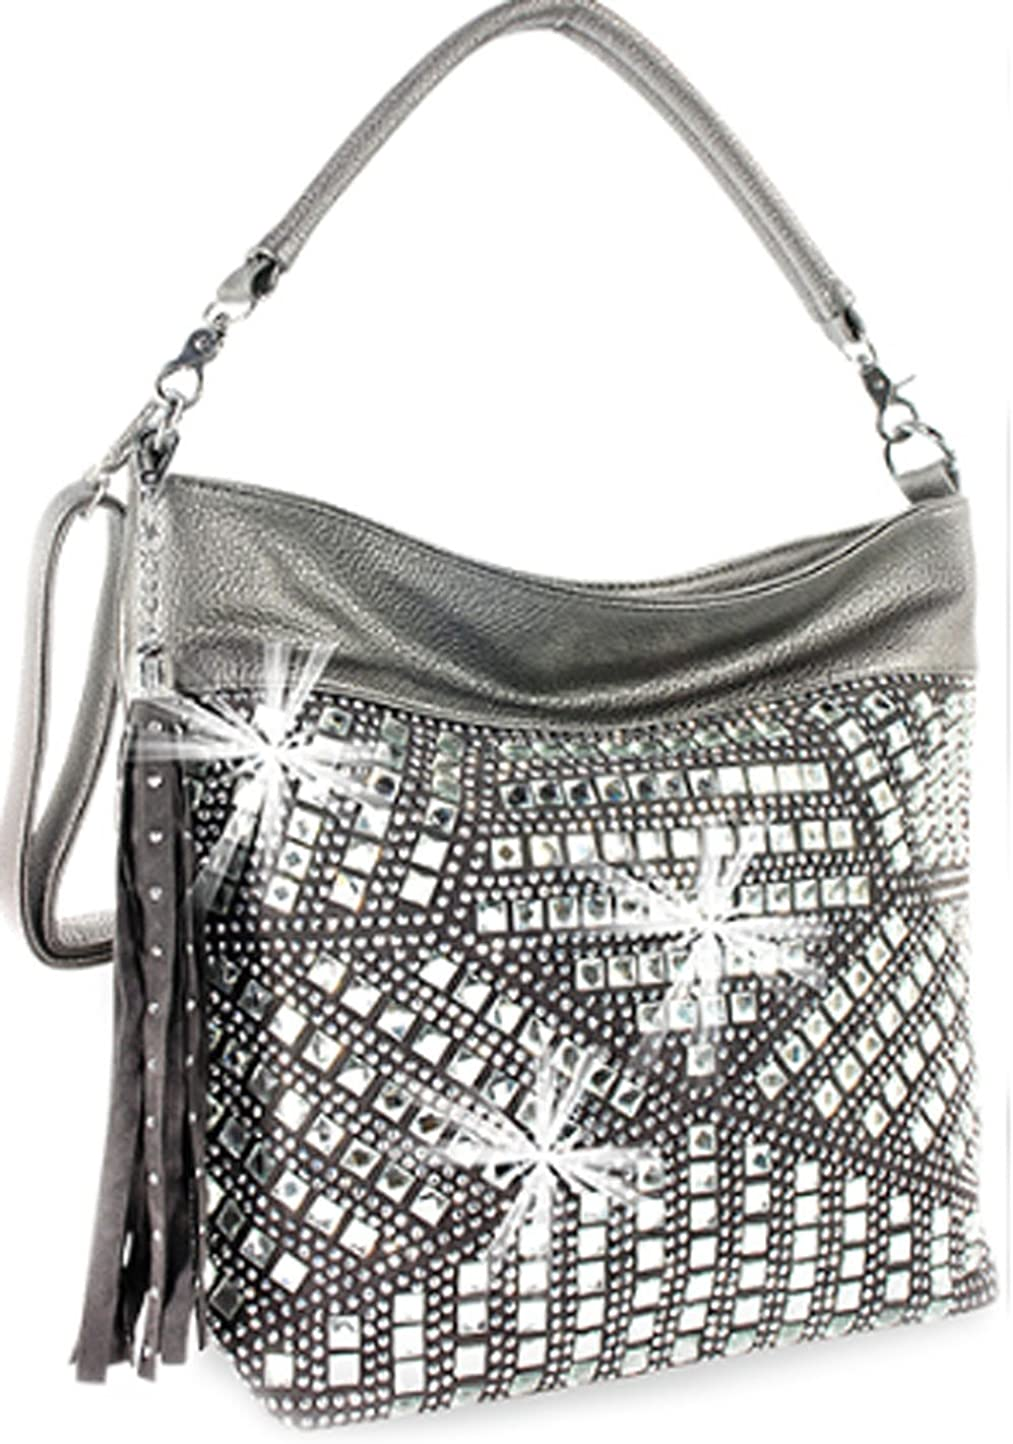 Zzfab Geometric Gem Sparkle Hobo Bag with Tassle Bling Cross Body